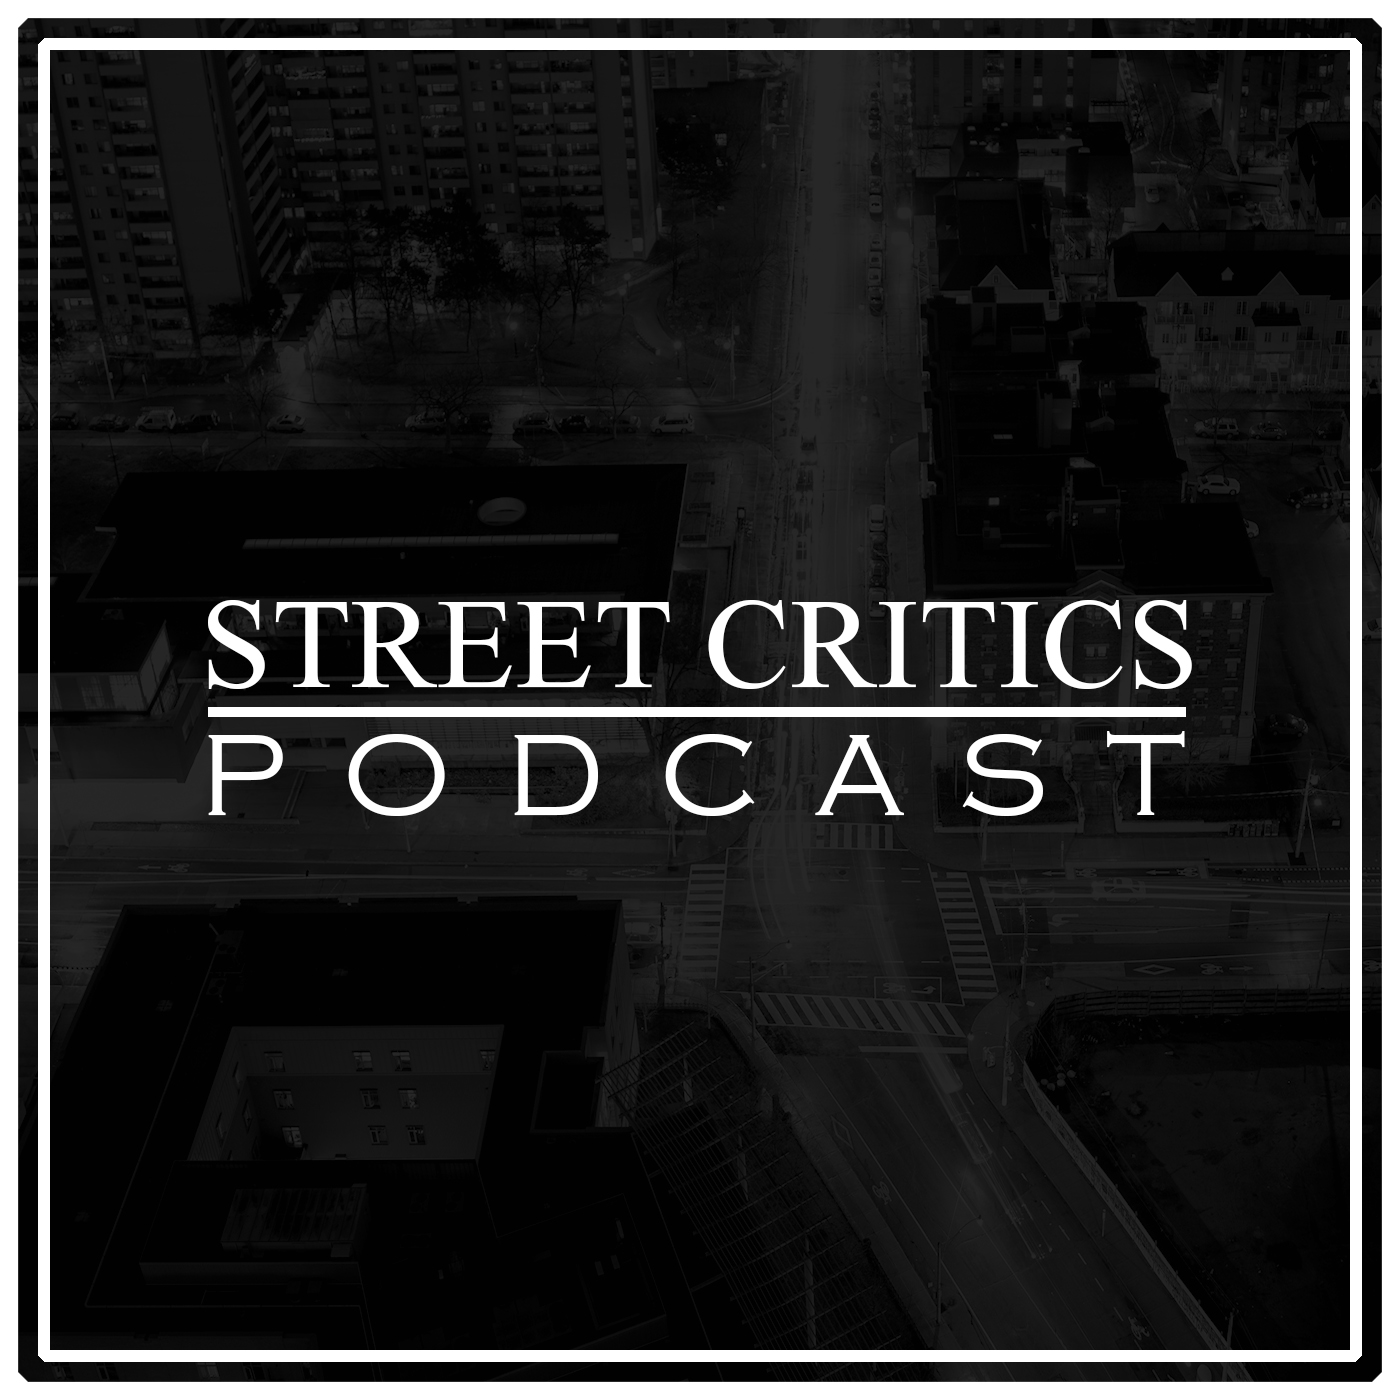 Street Critics